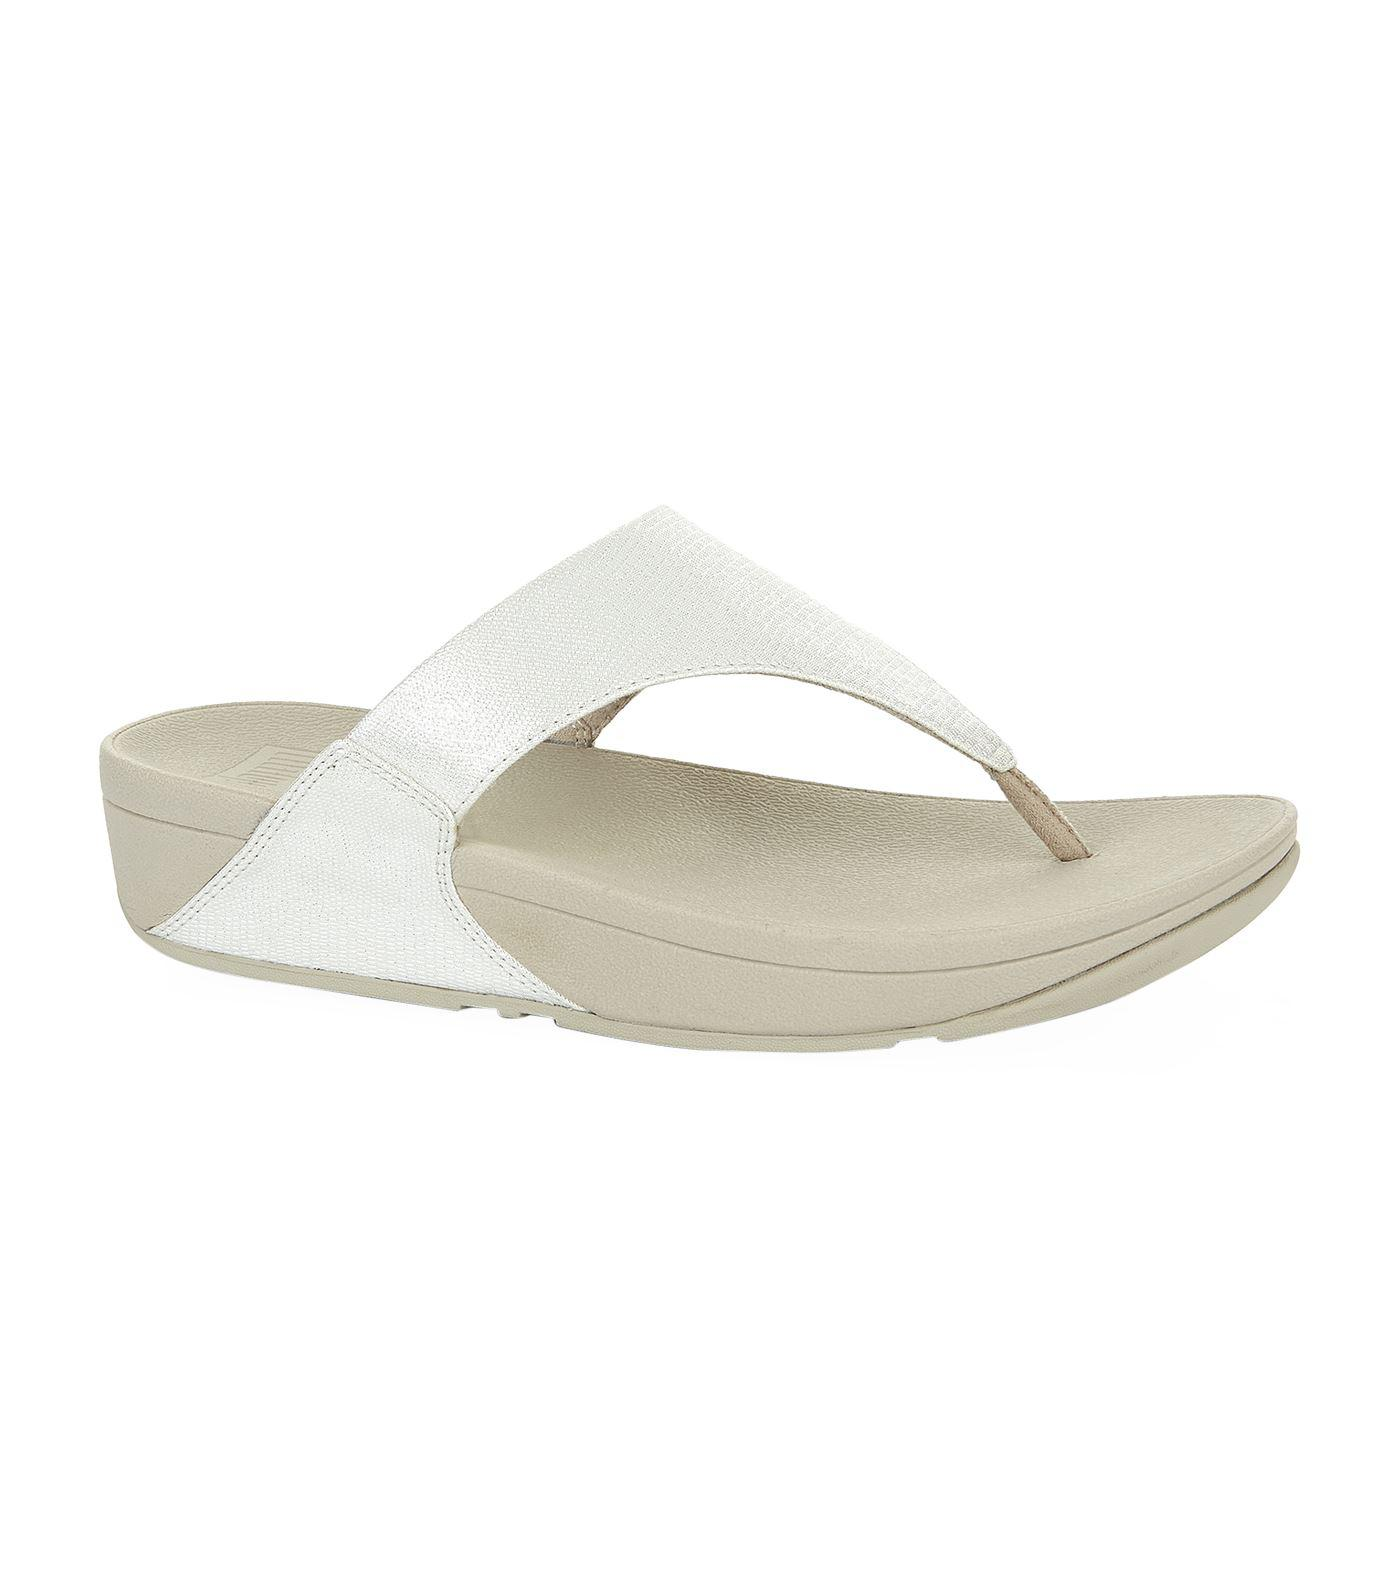 026a3ae98 Lyst - Fitflop Lulu Shimmy Lizard Sandals in Metallic